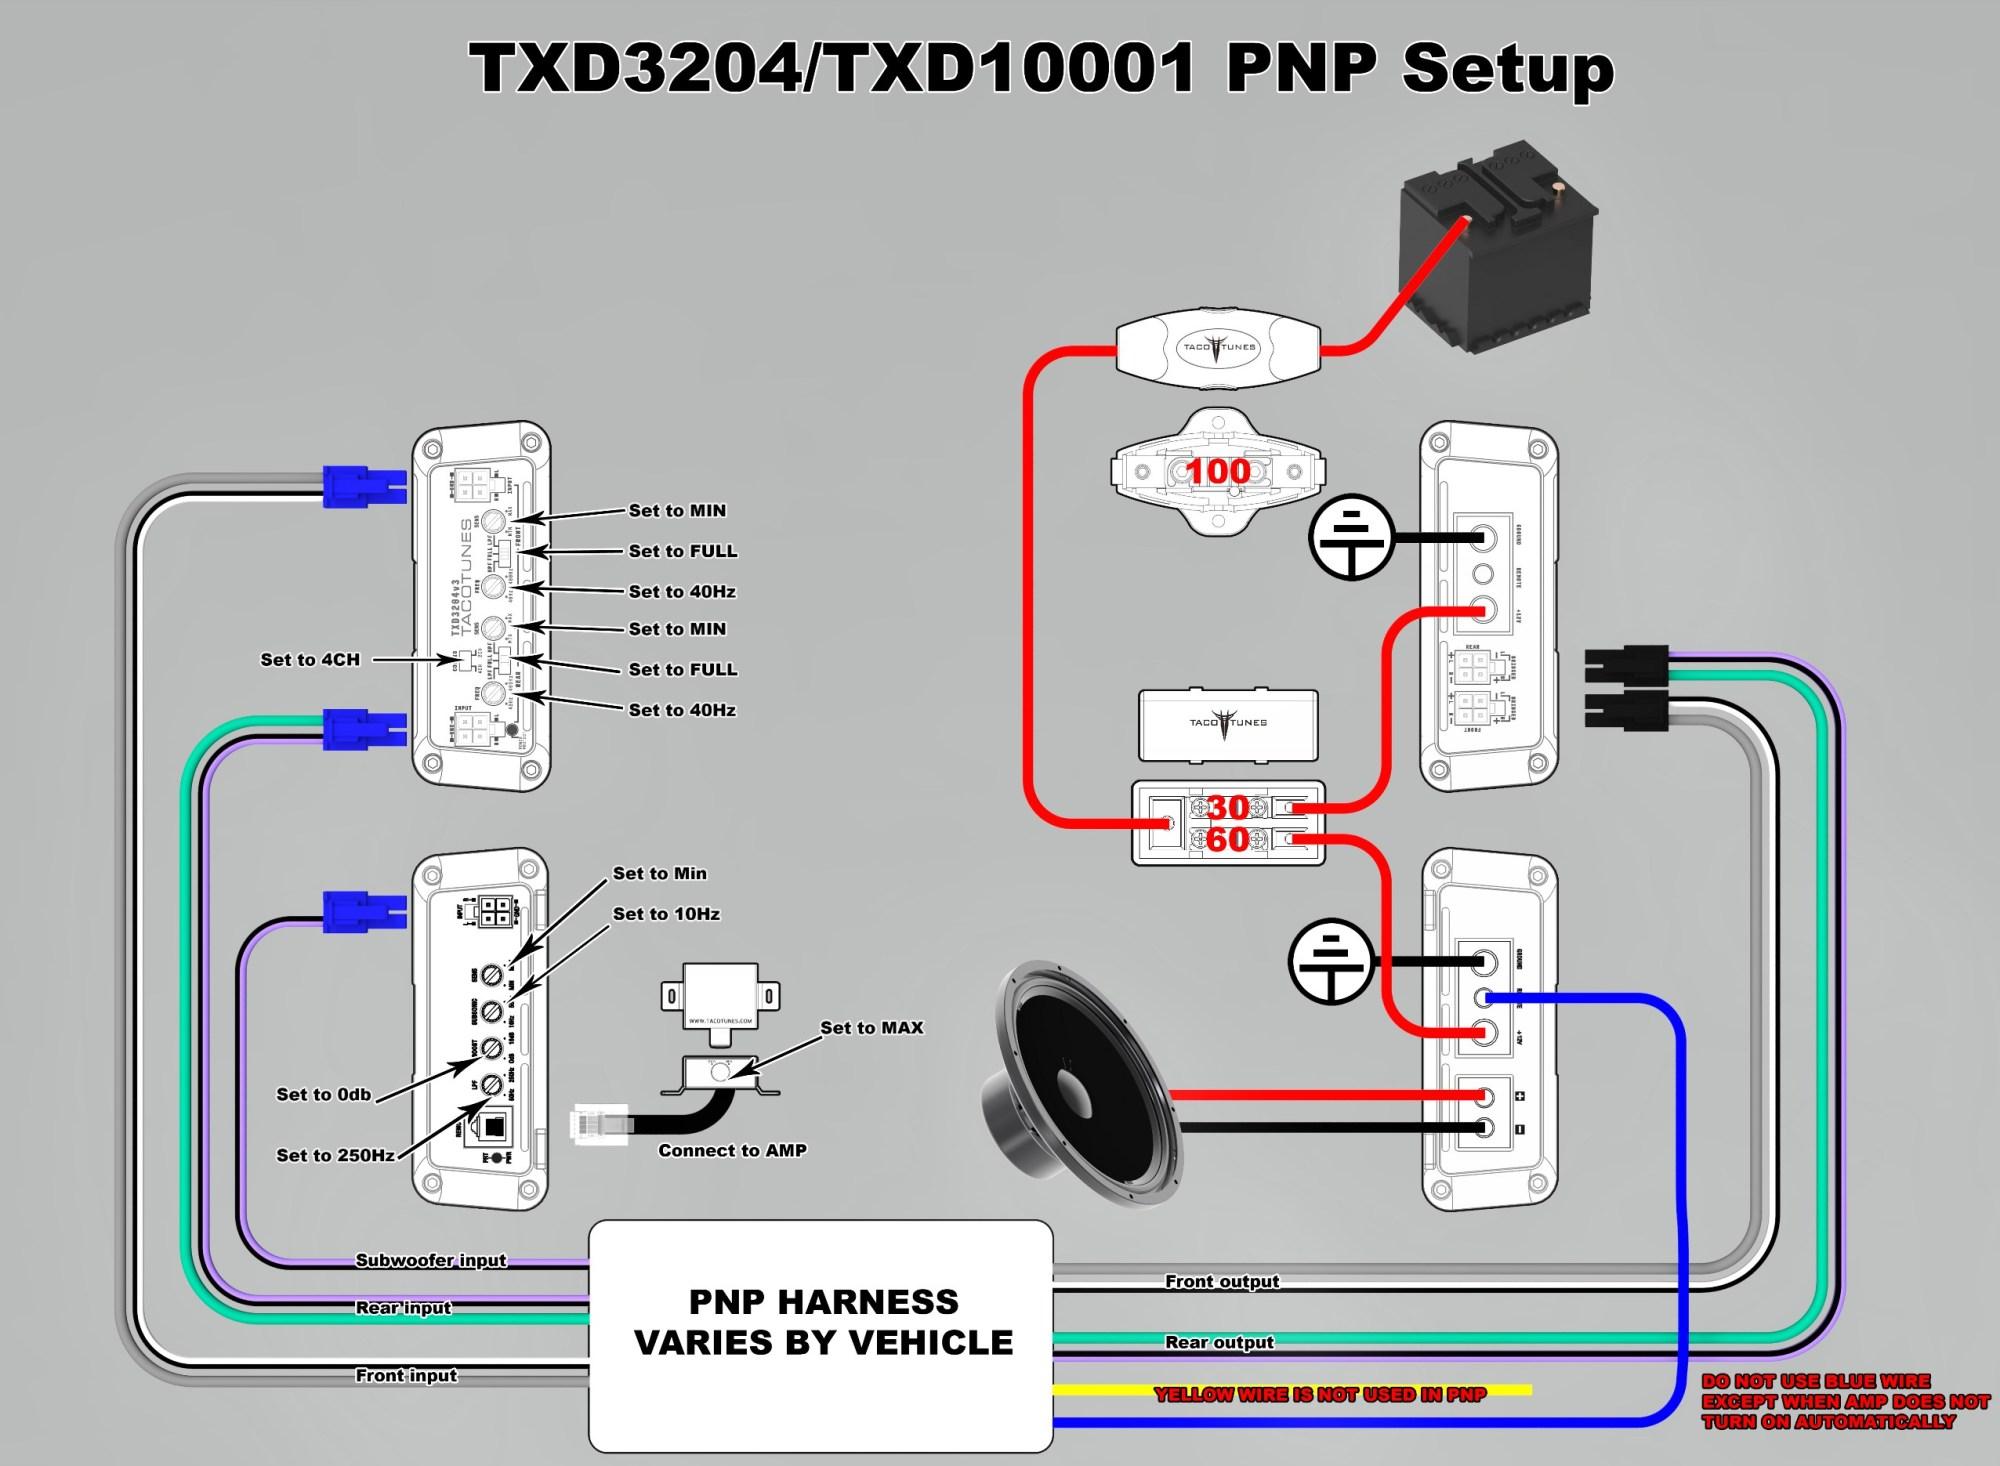 hight resolution of txd3204 txd10001 wiring diagram toyota tundra